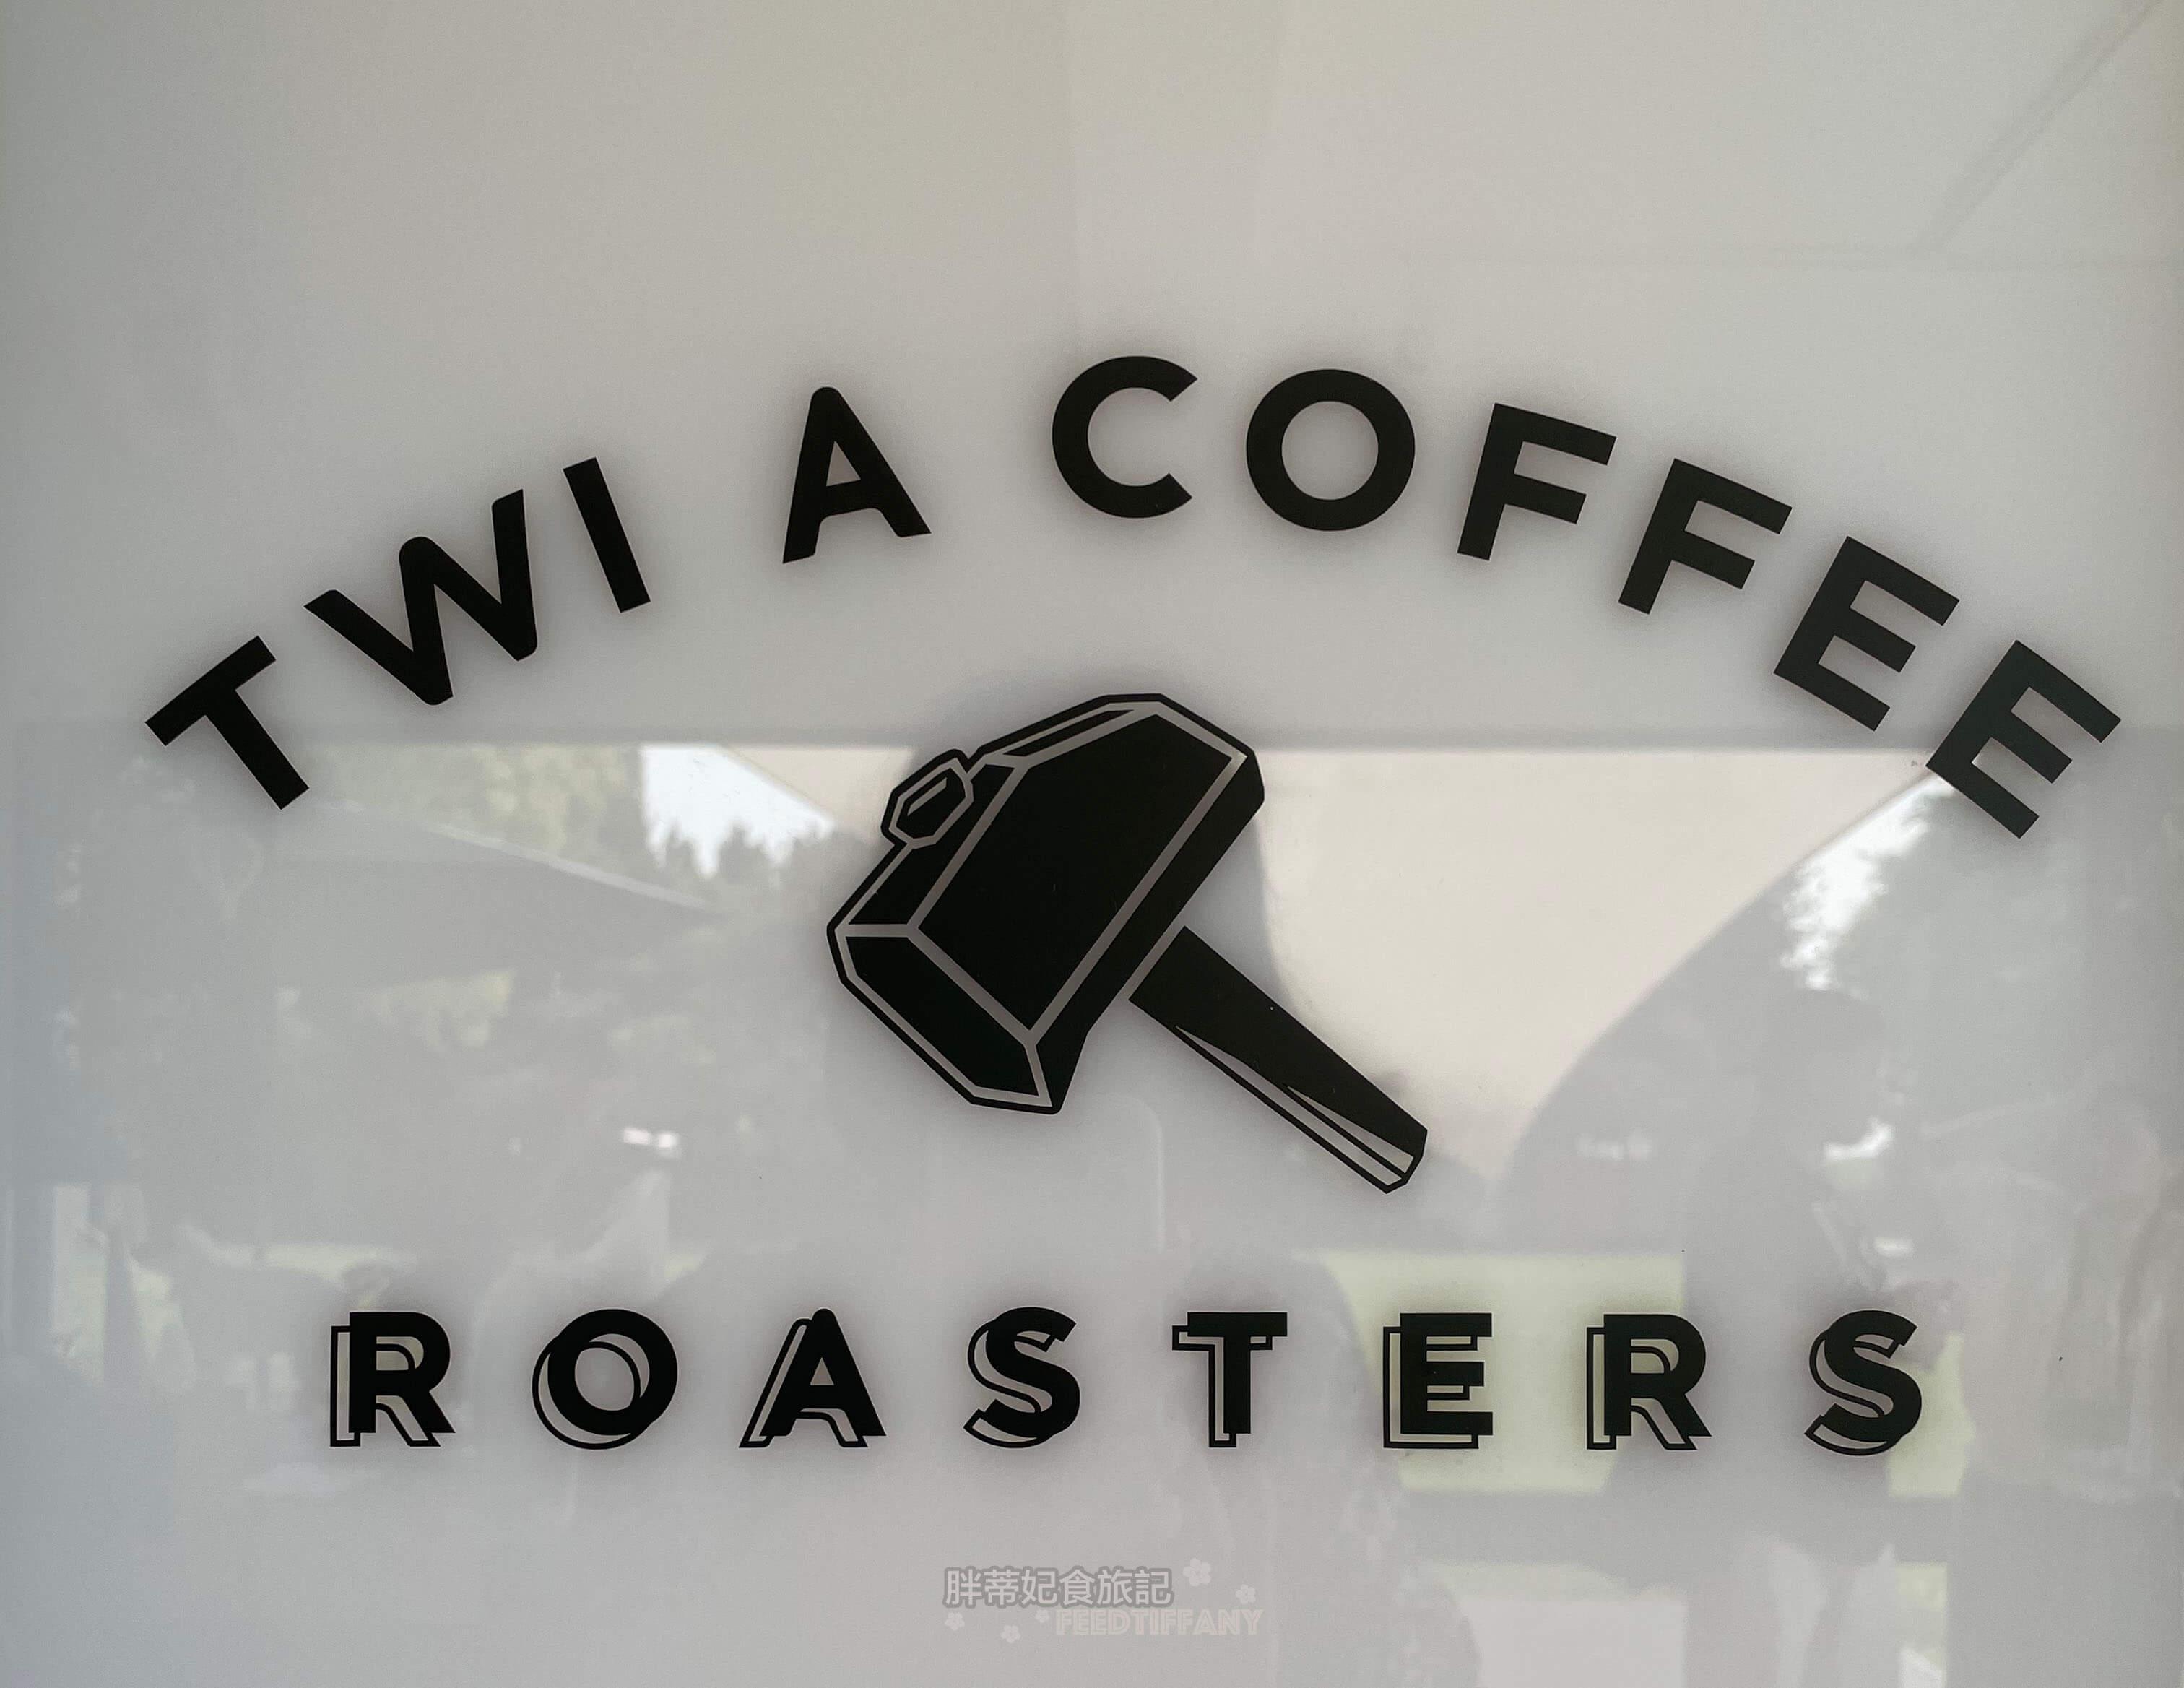 Twi A錘子咖啡烘焙坊 的招牌